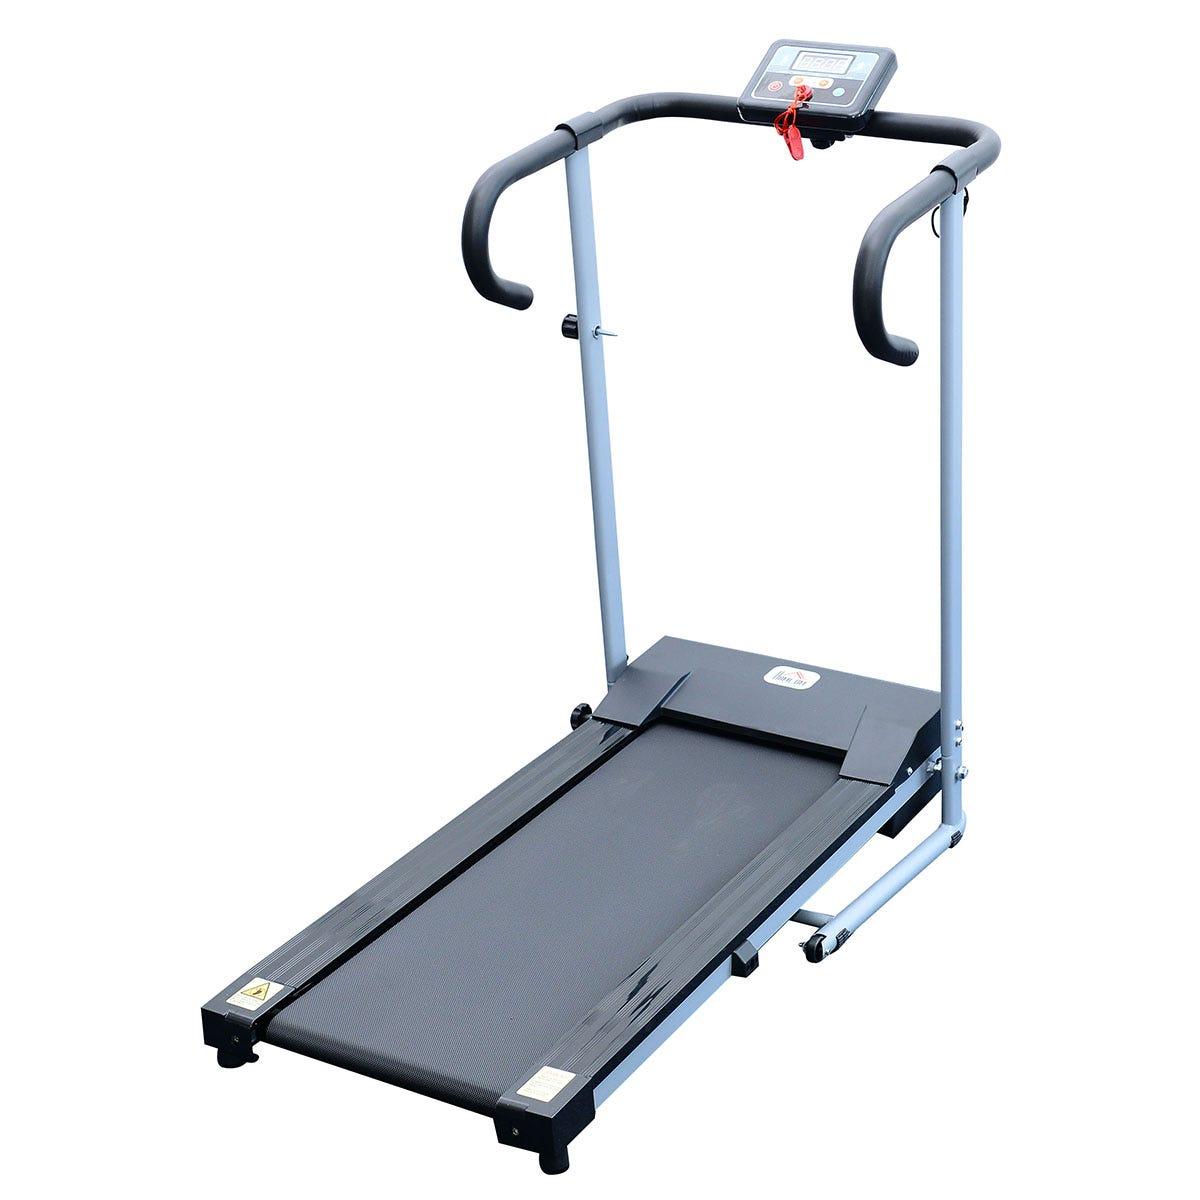 HOMCOM New Motorised Electric Treadmill Running Machine Fitness Folding Power Exercise